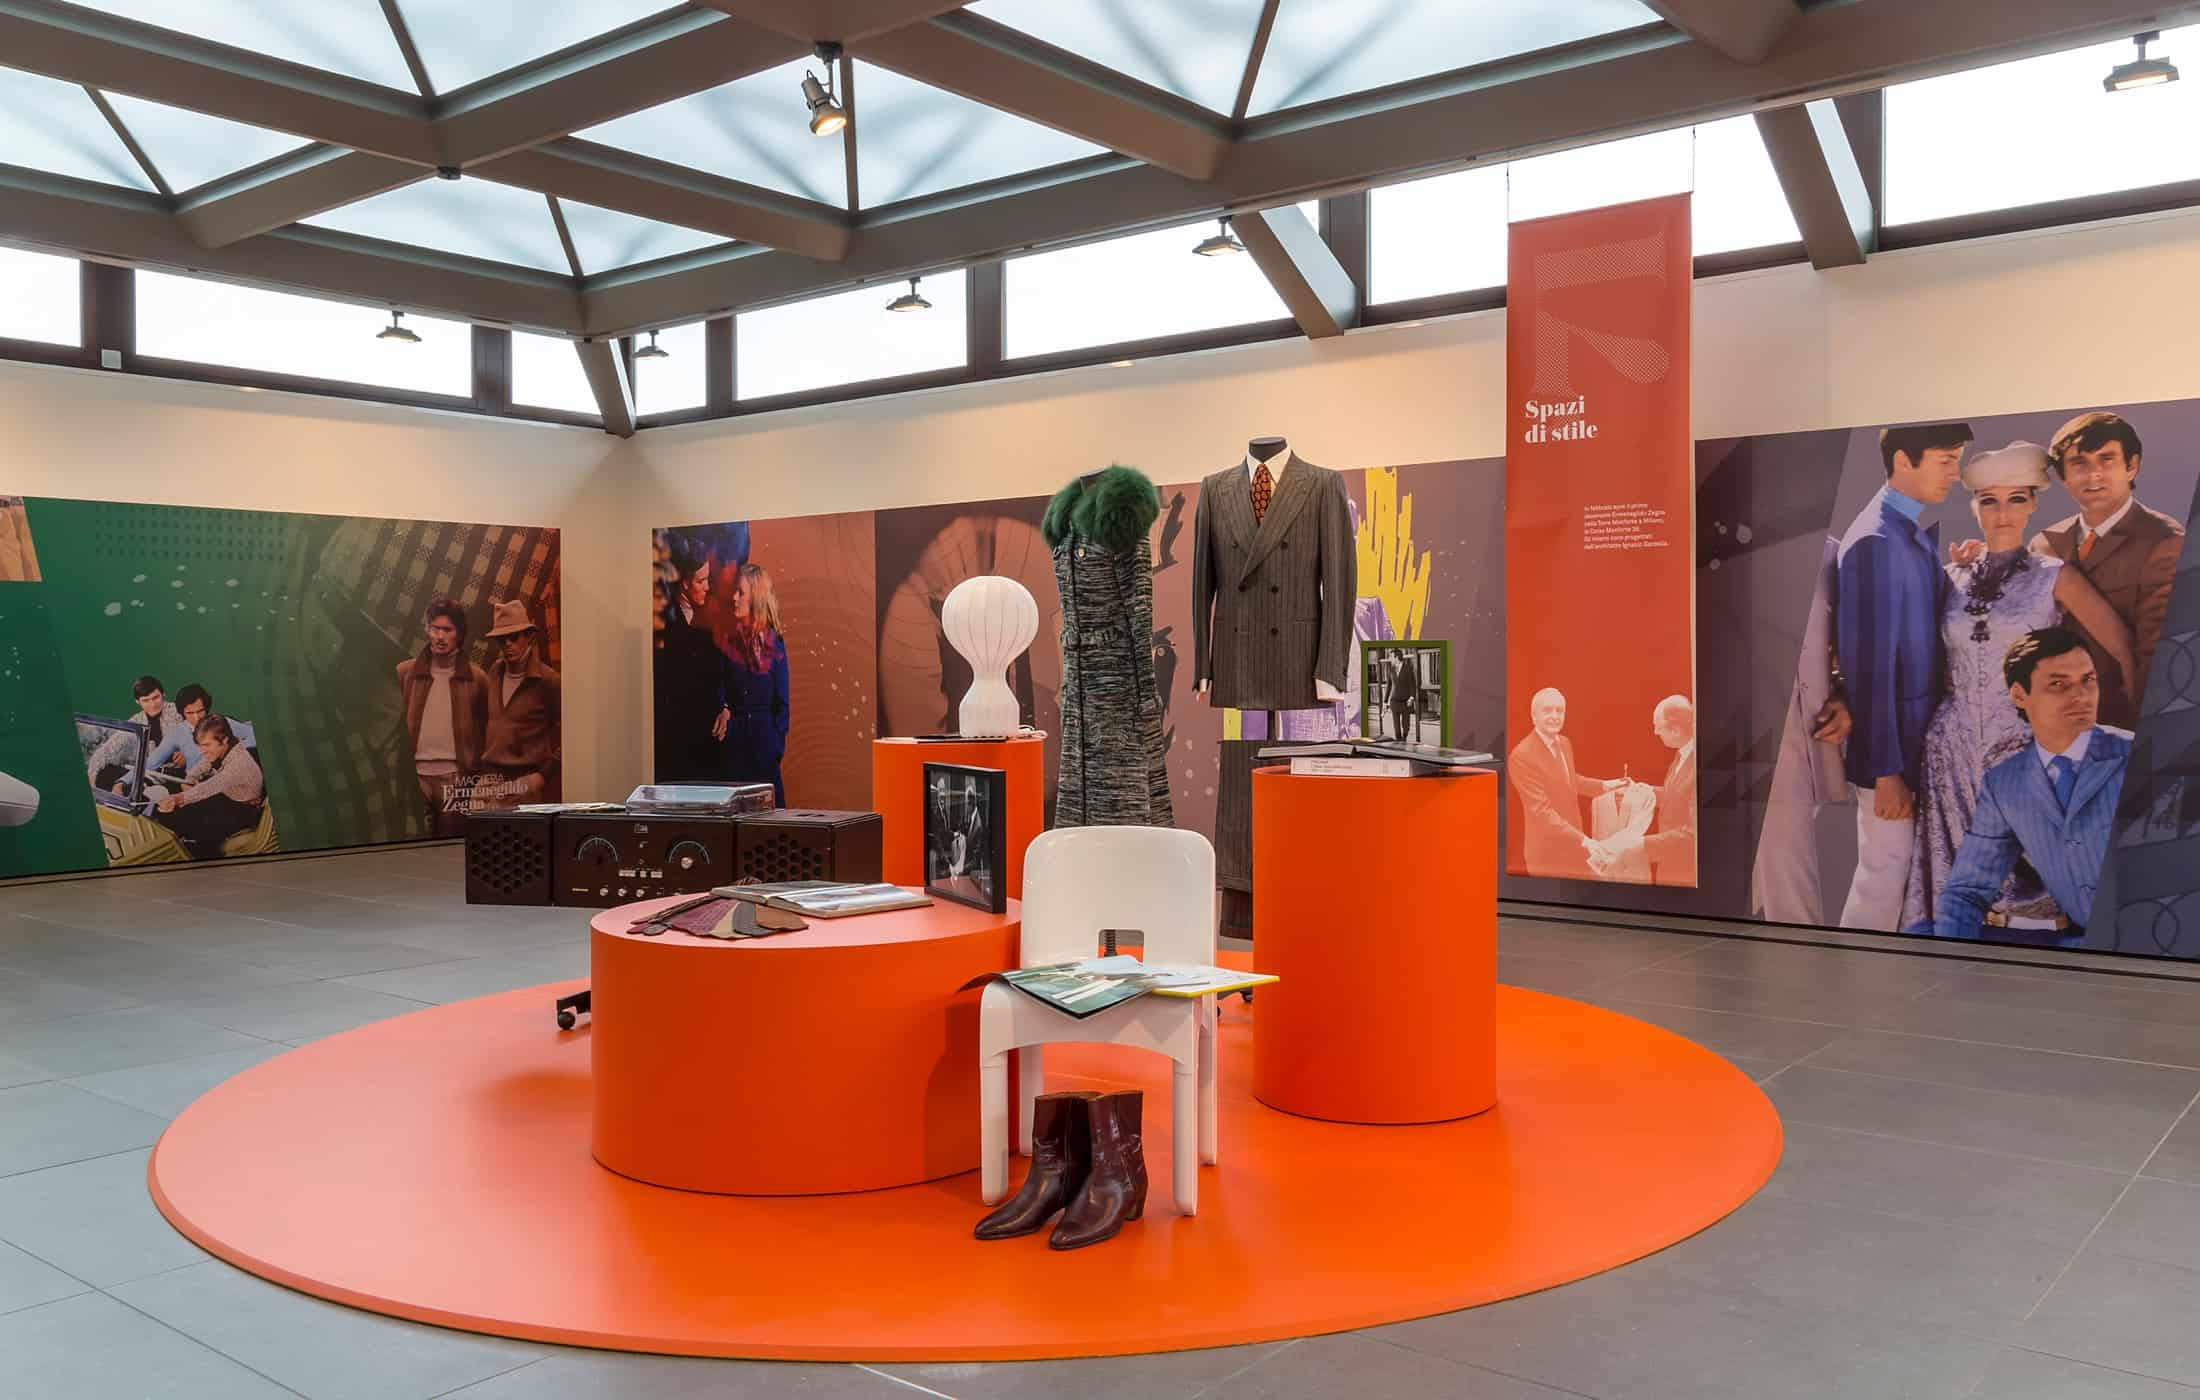 ermenegildo-zegna-exhibition-13